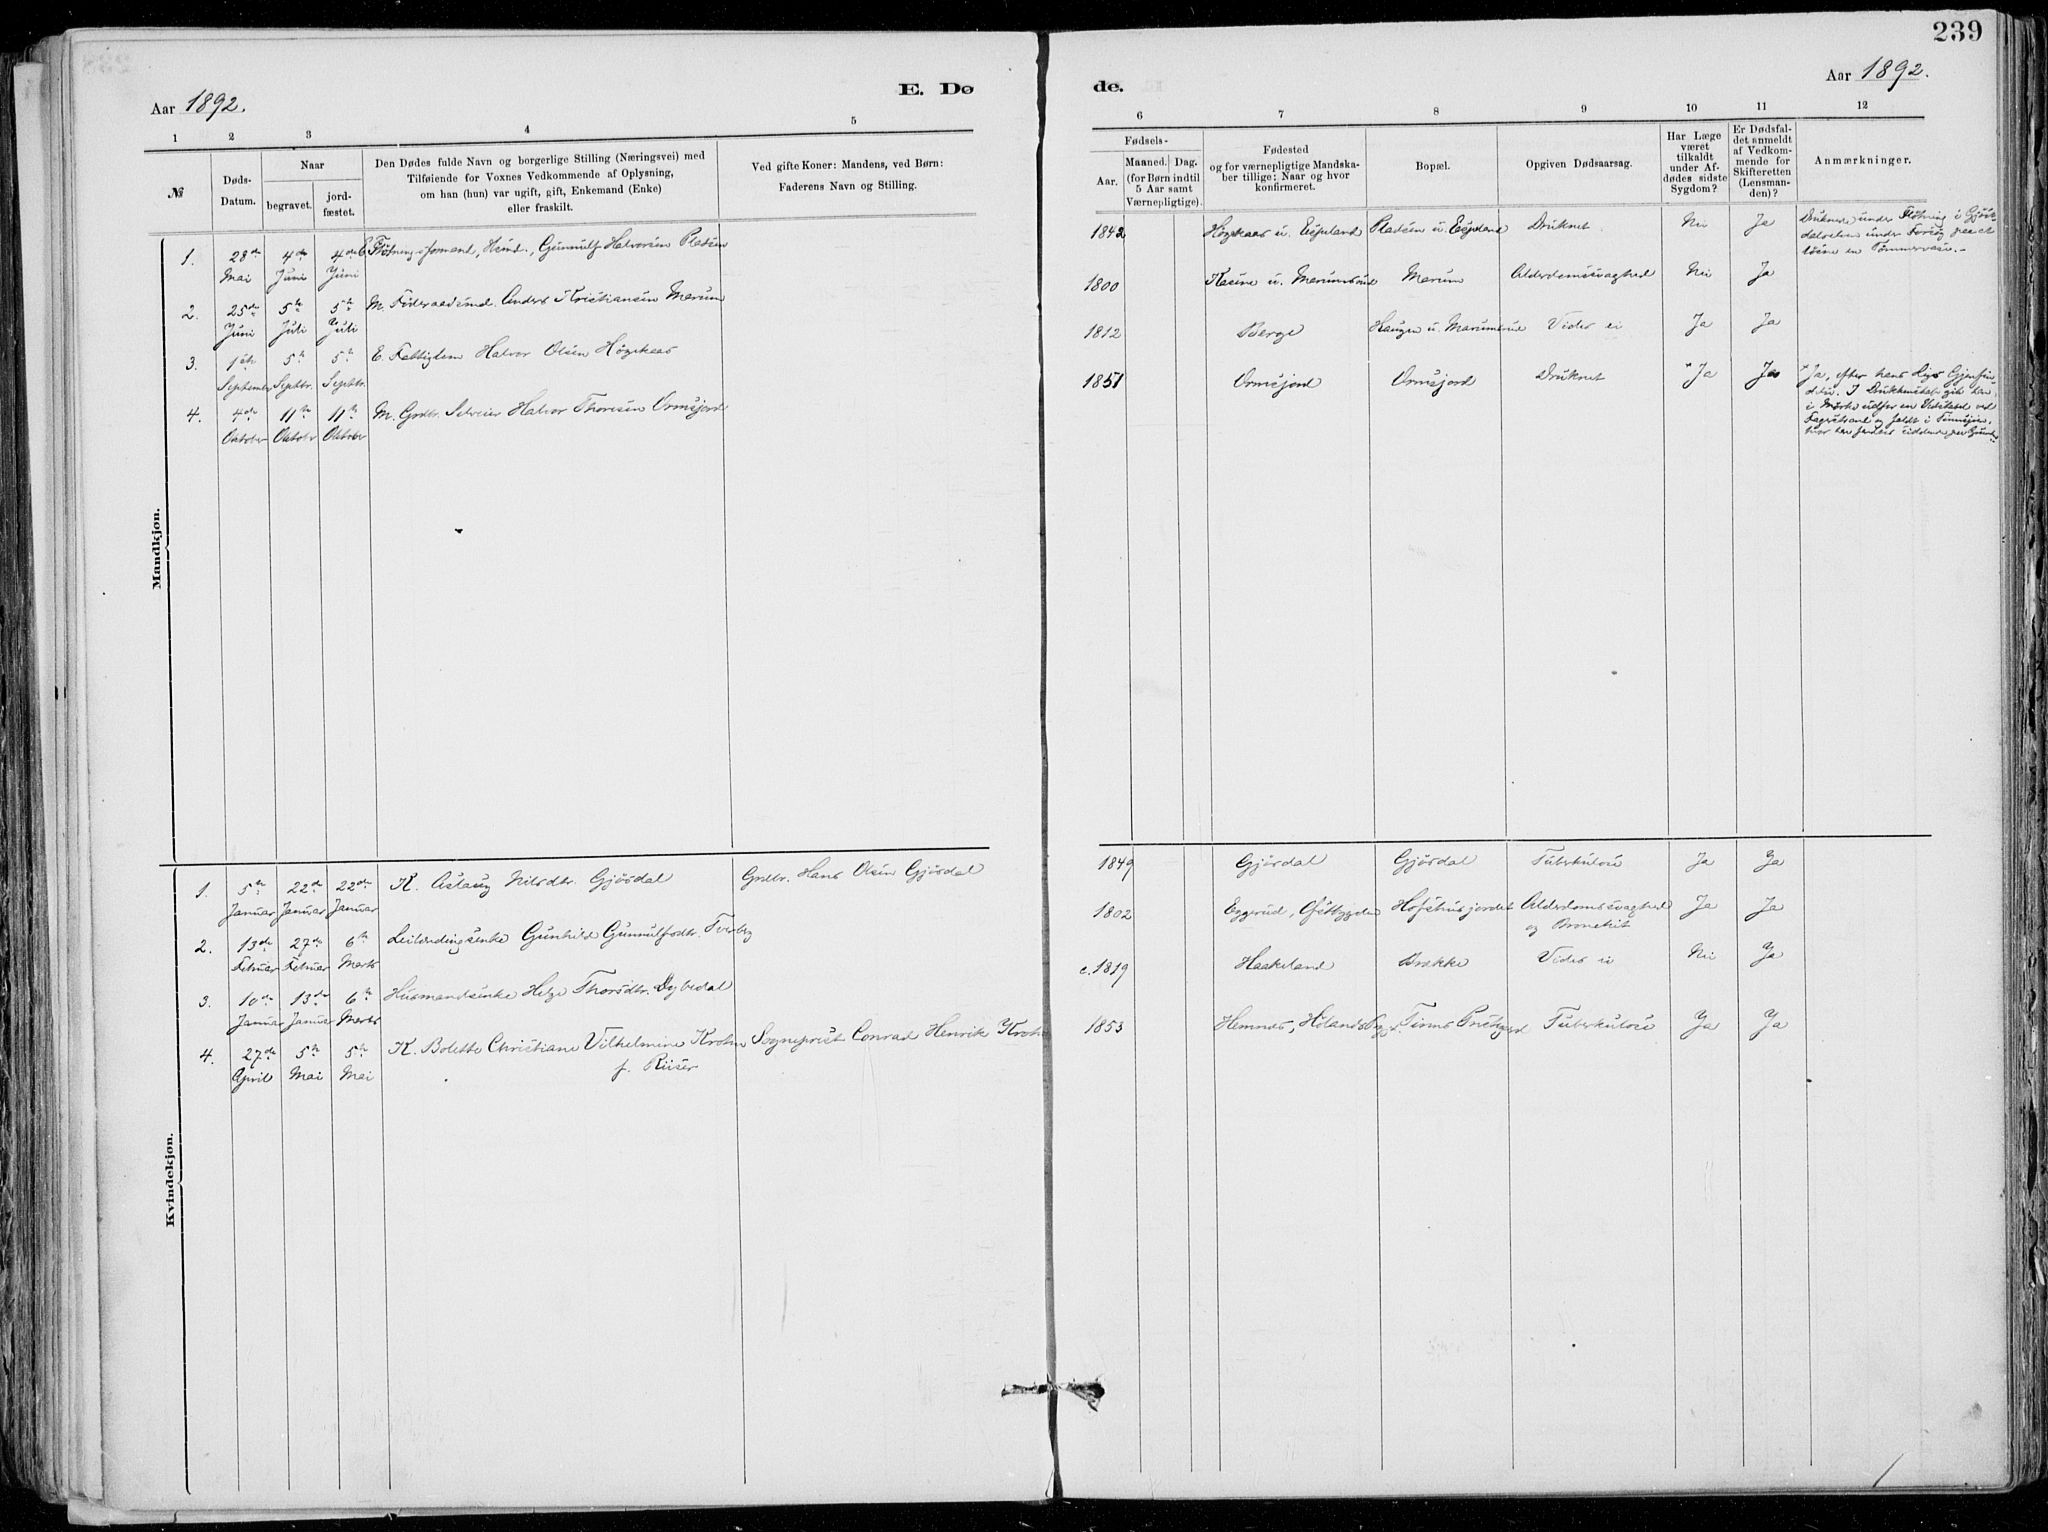 SAKO, Tinn kirkebøker, F/Fa/L0007: Ministerialbok nr. I 7, 1878-1922, s. 239